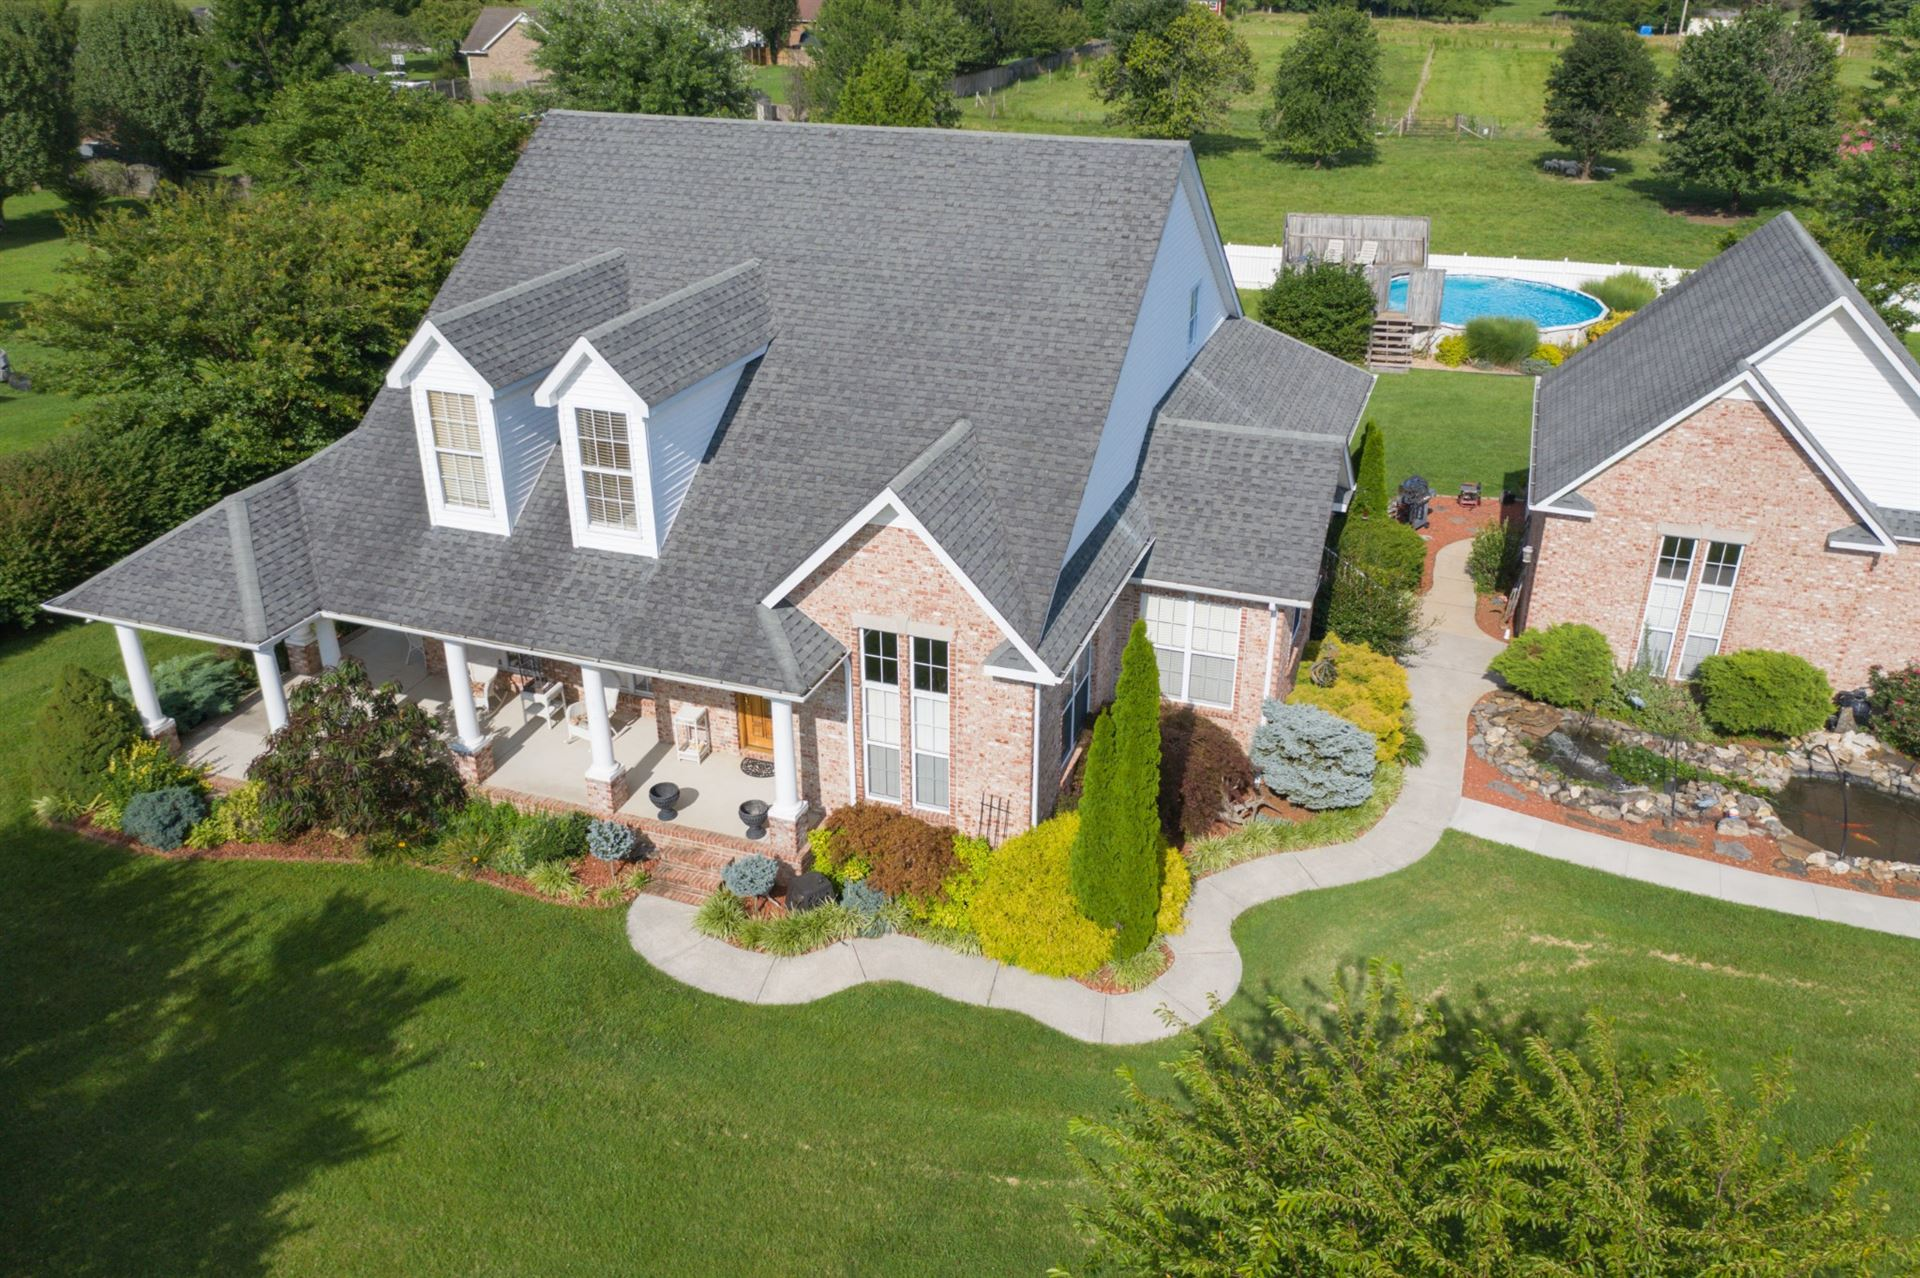 110 Maple Bend Rd, Winchester, TN 37398 - MLS#: 2271813